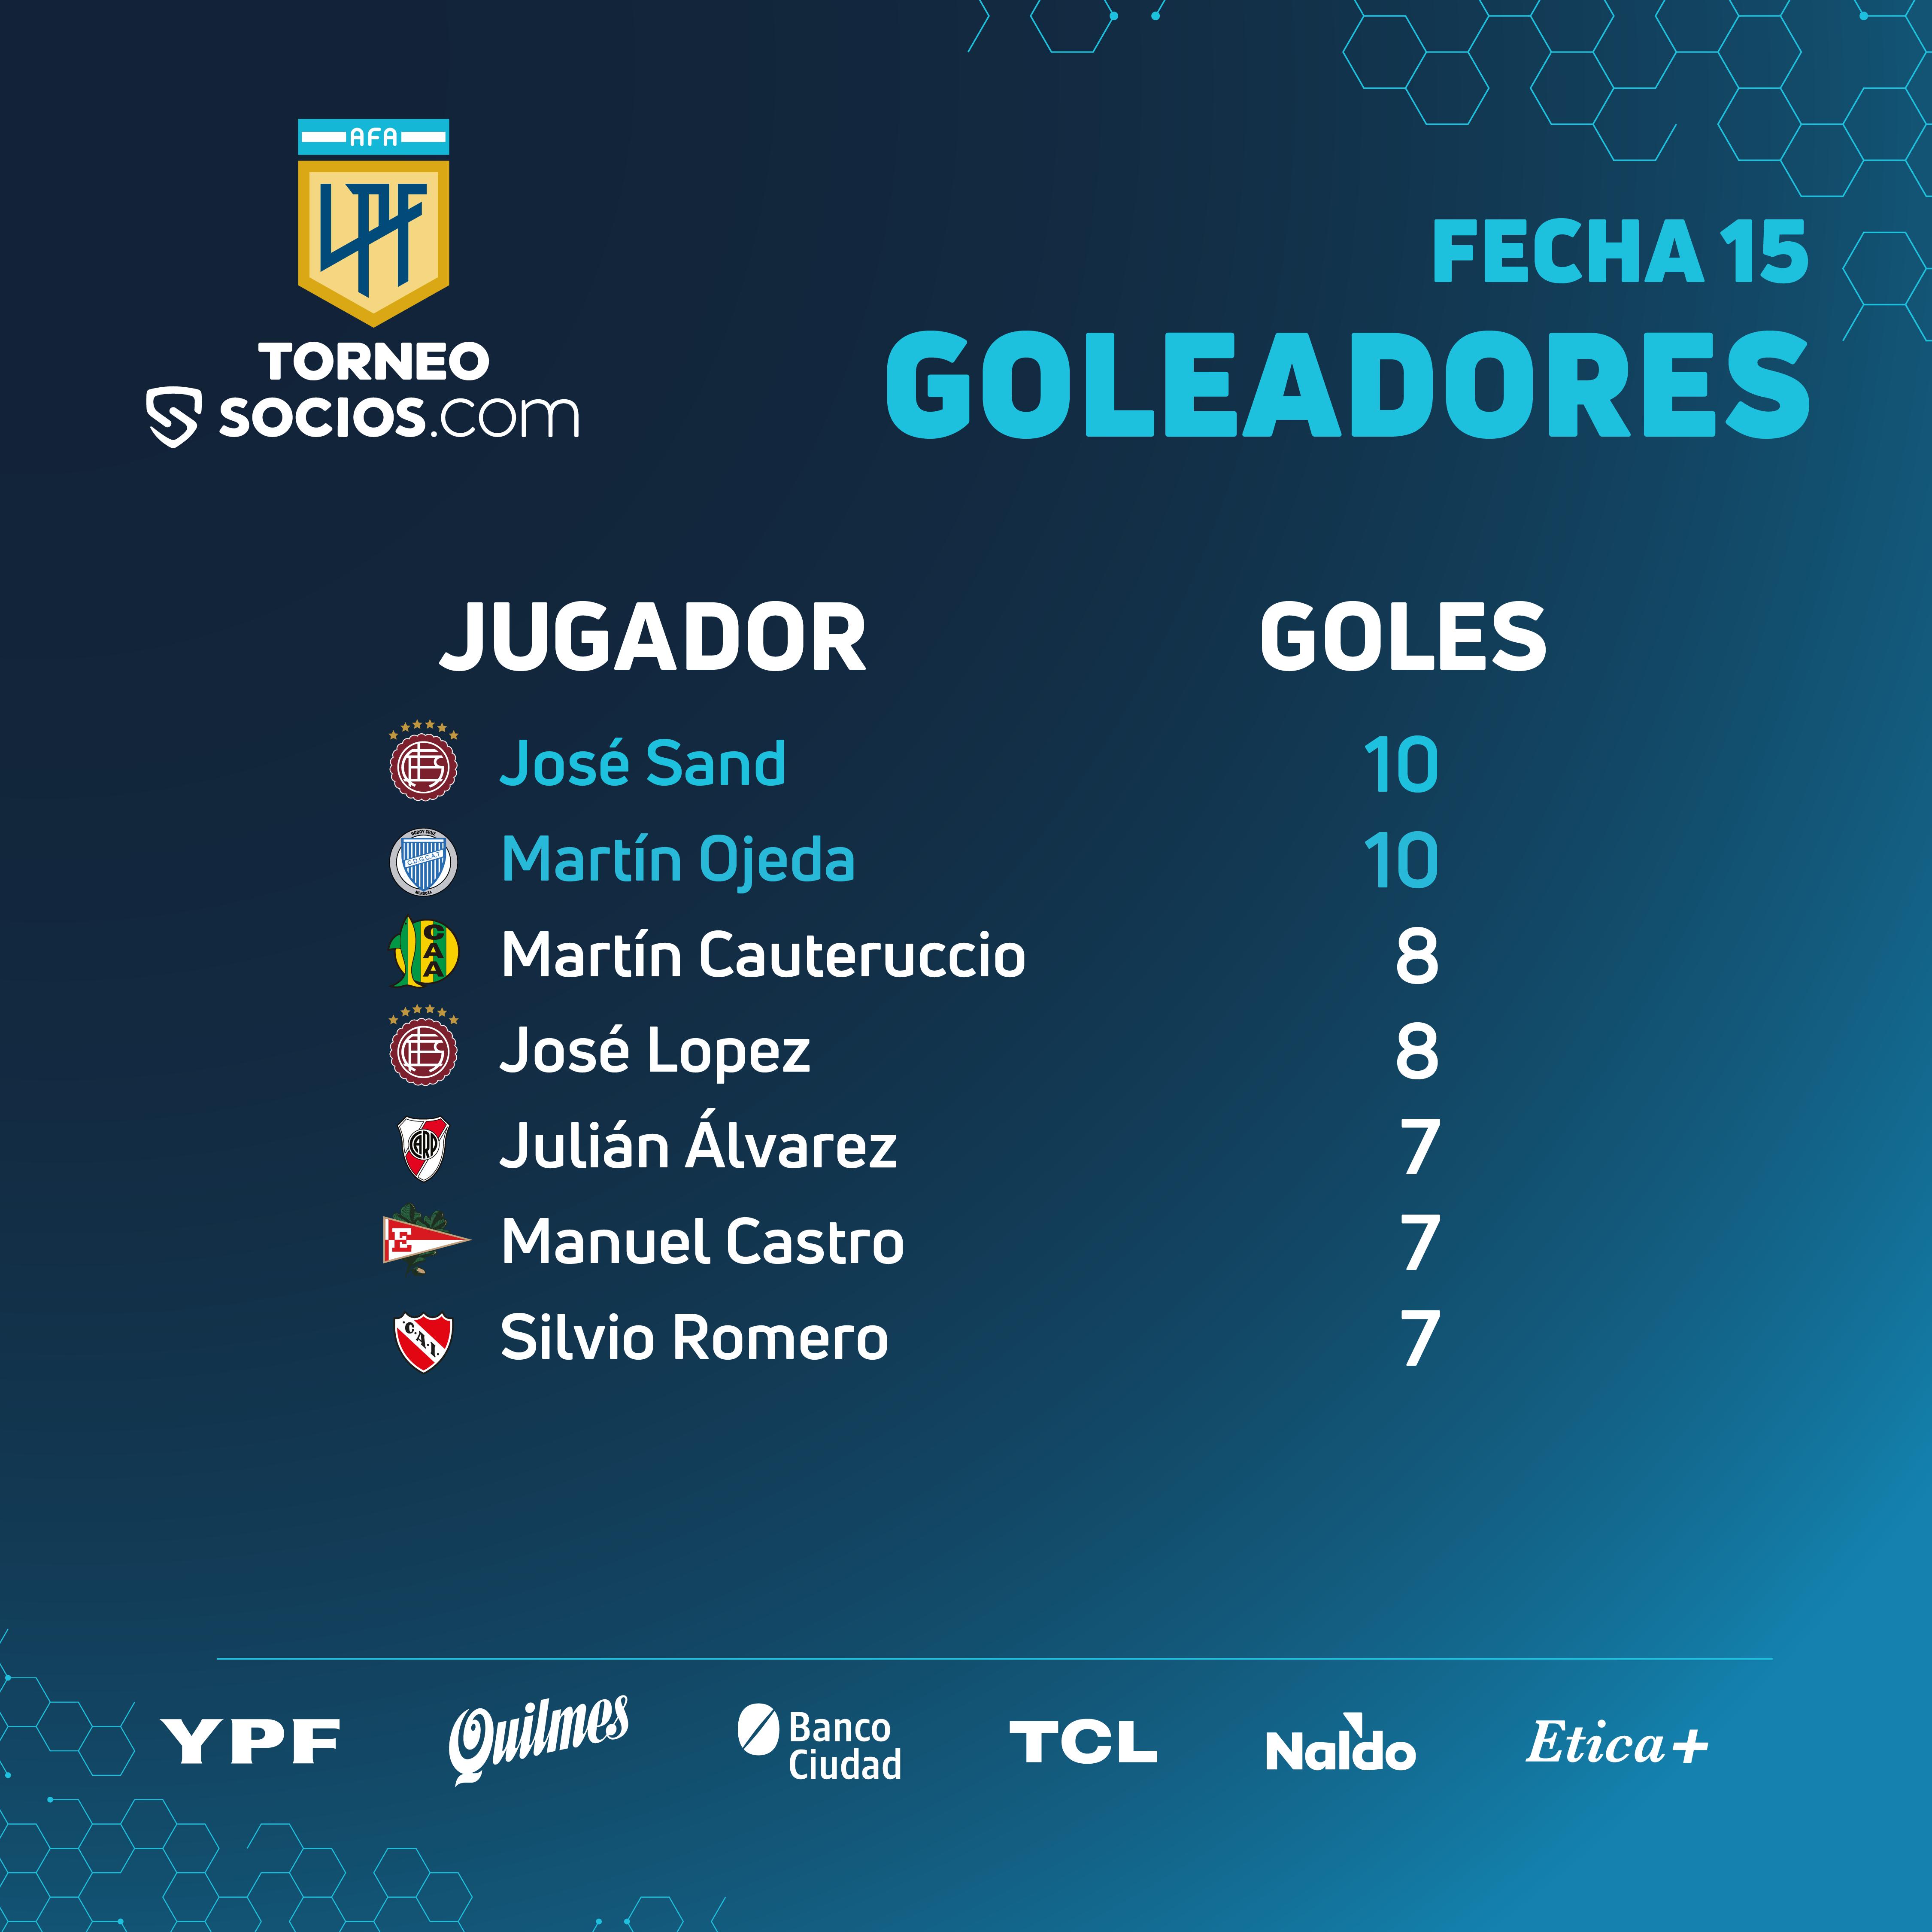 Goleadores-03-1